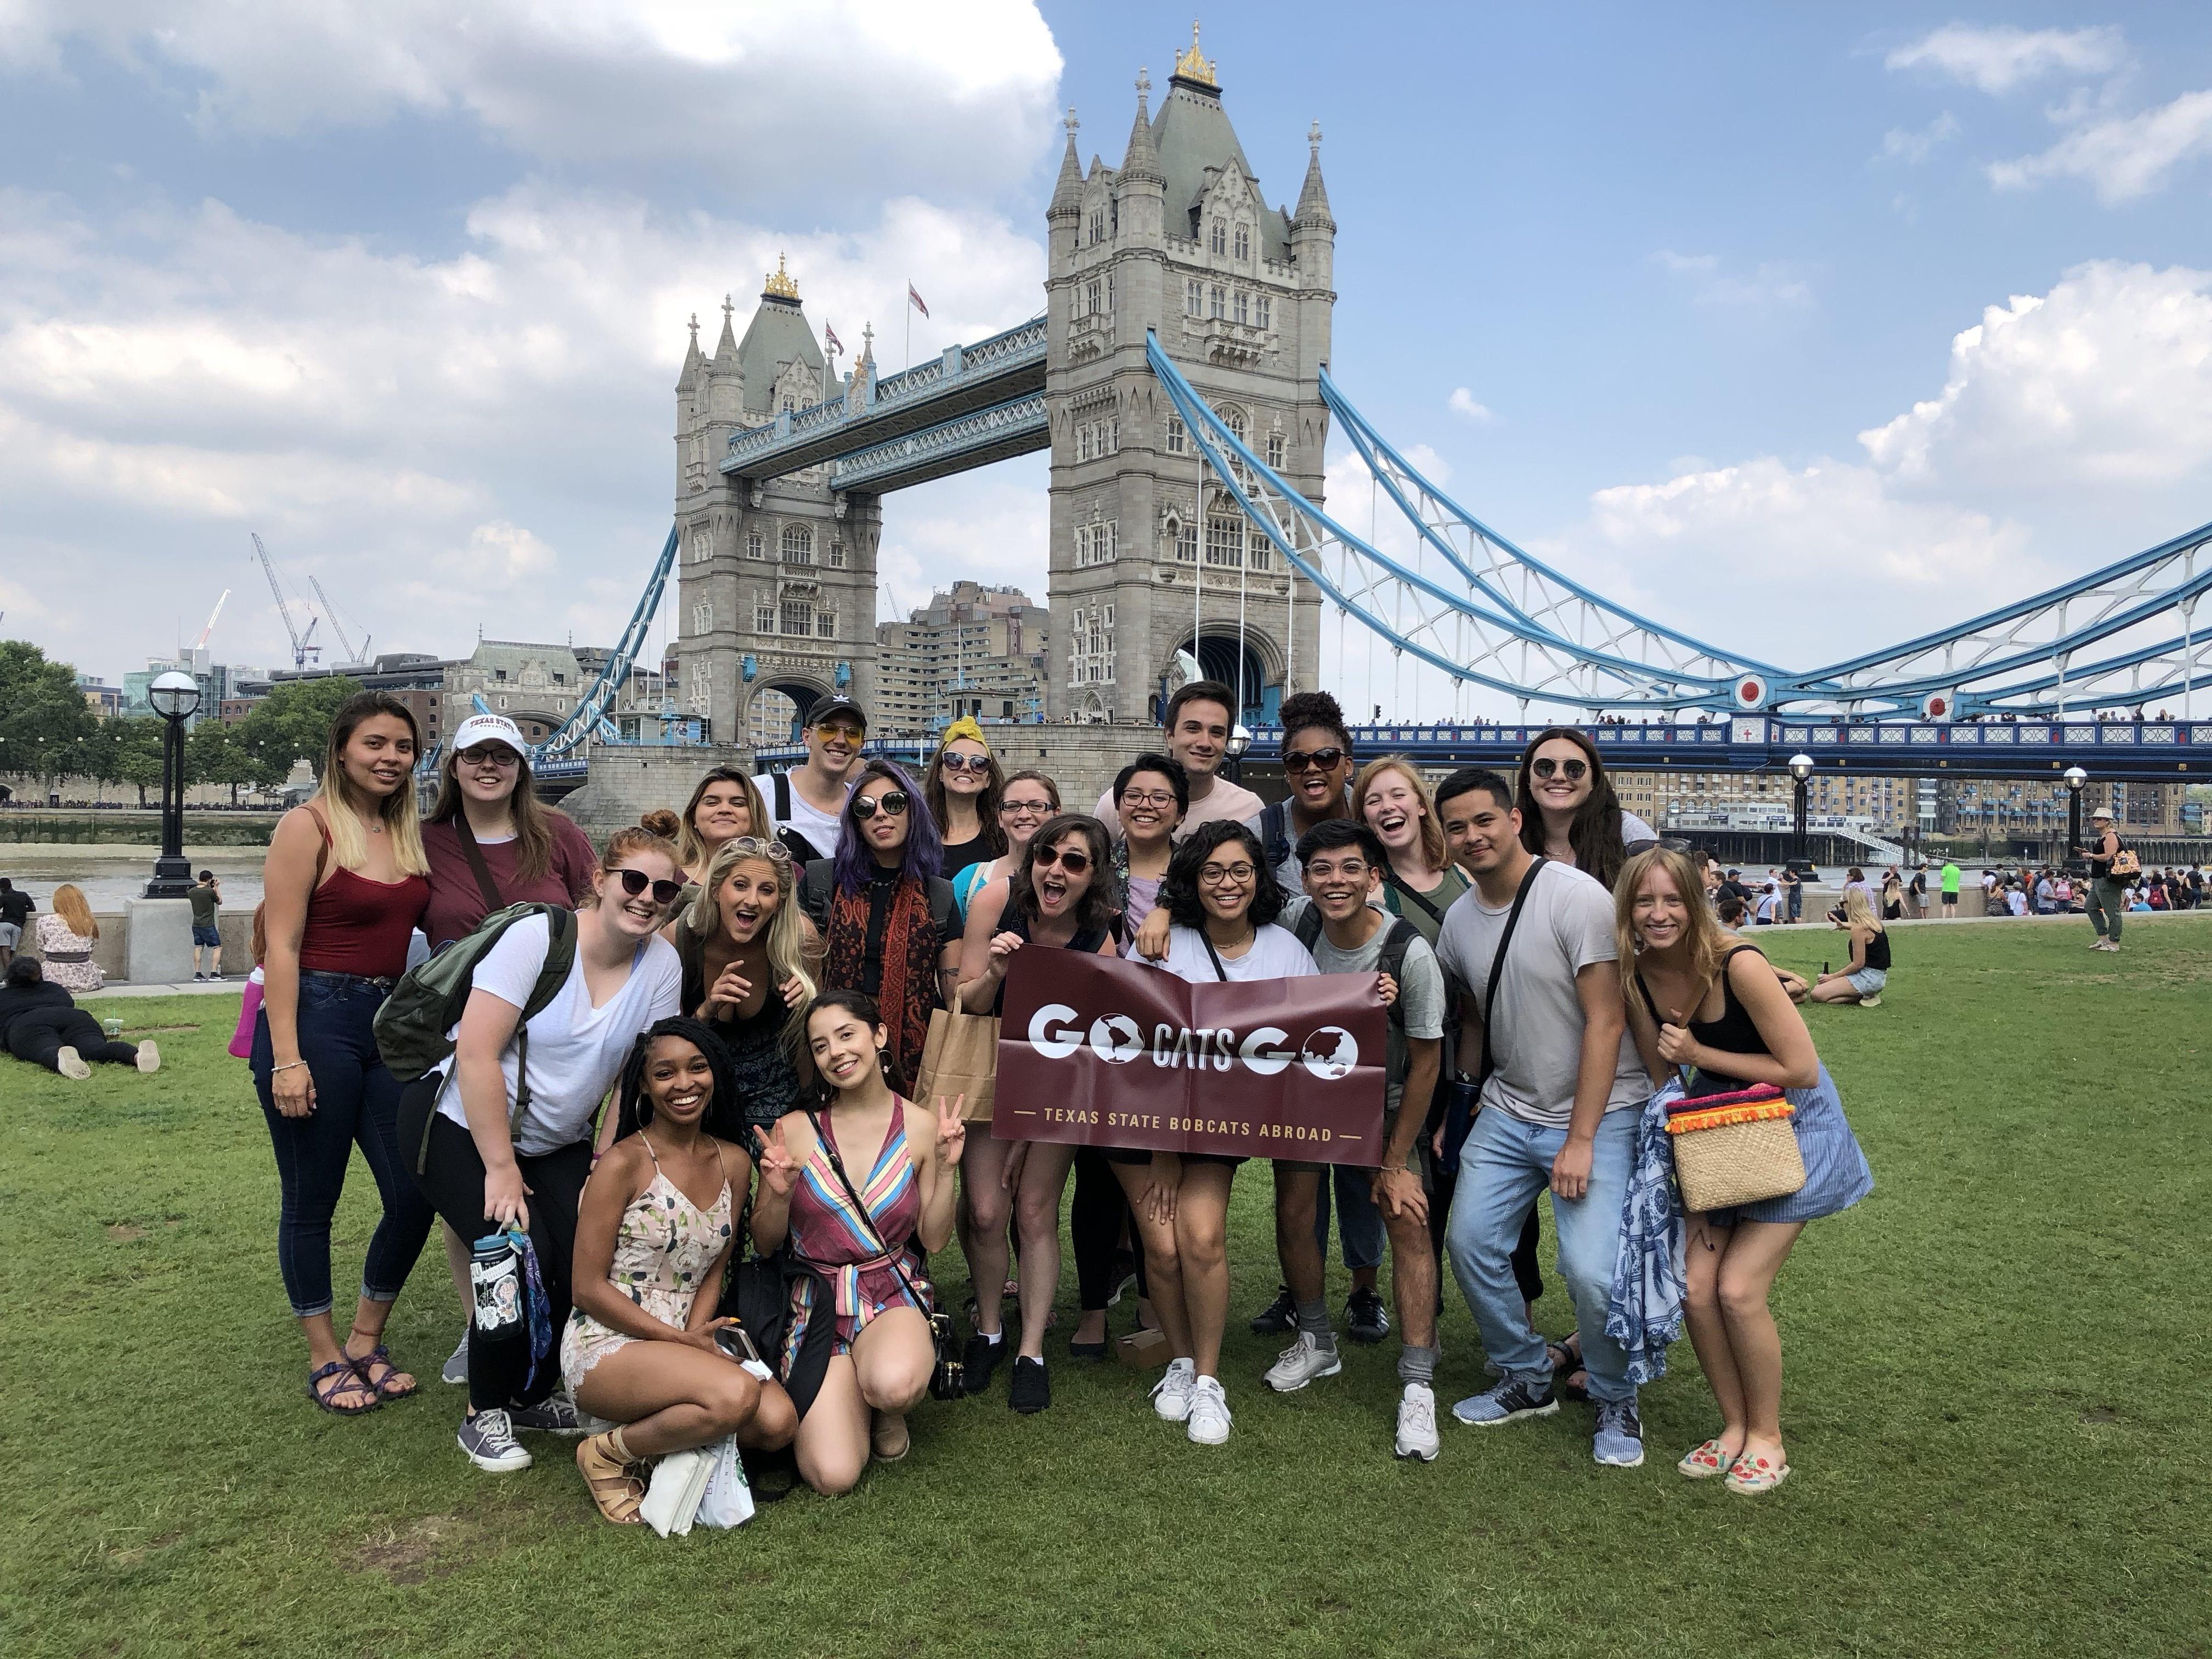 gorup photo Tower Bridge